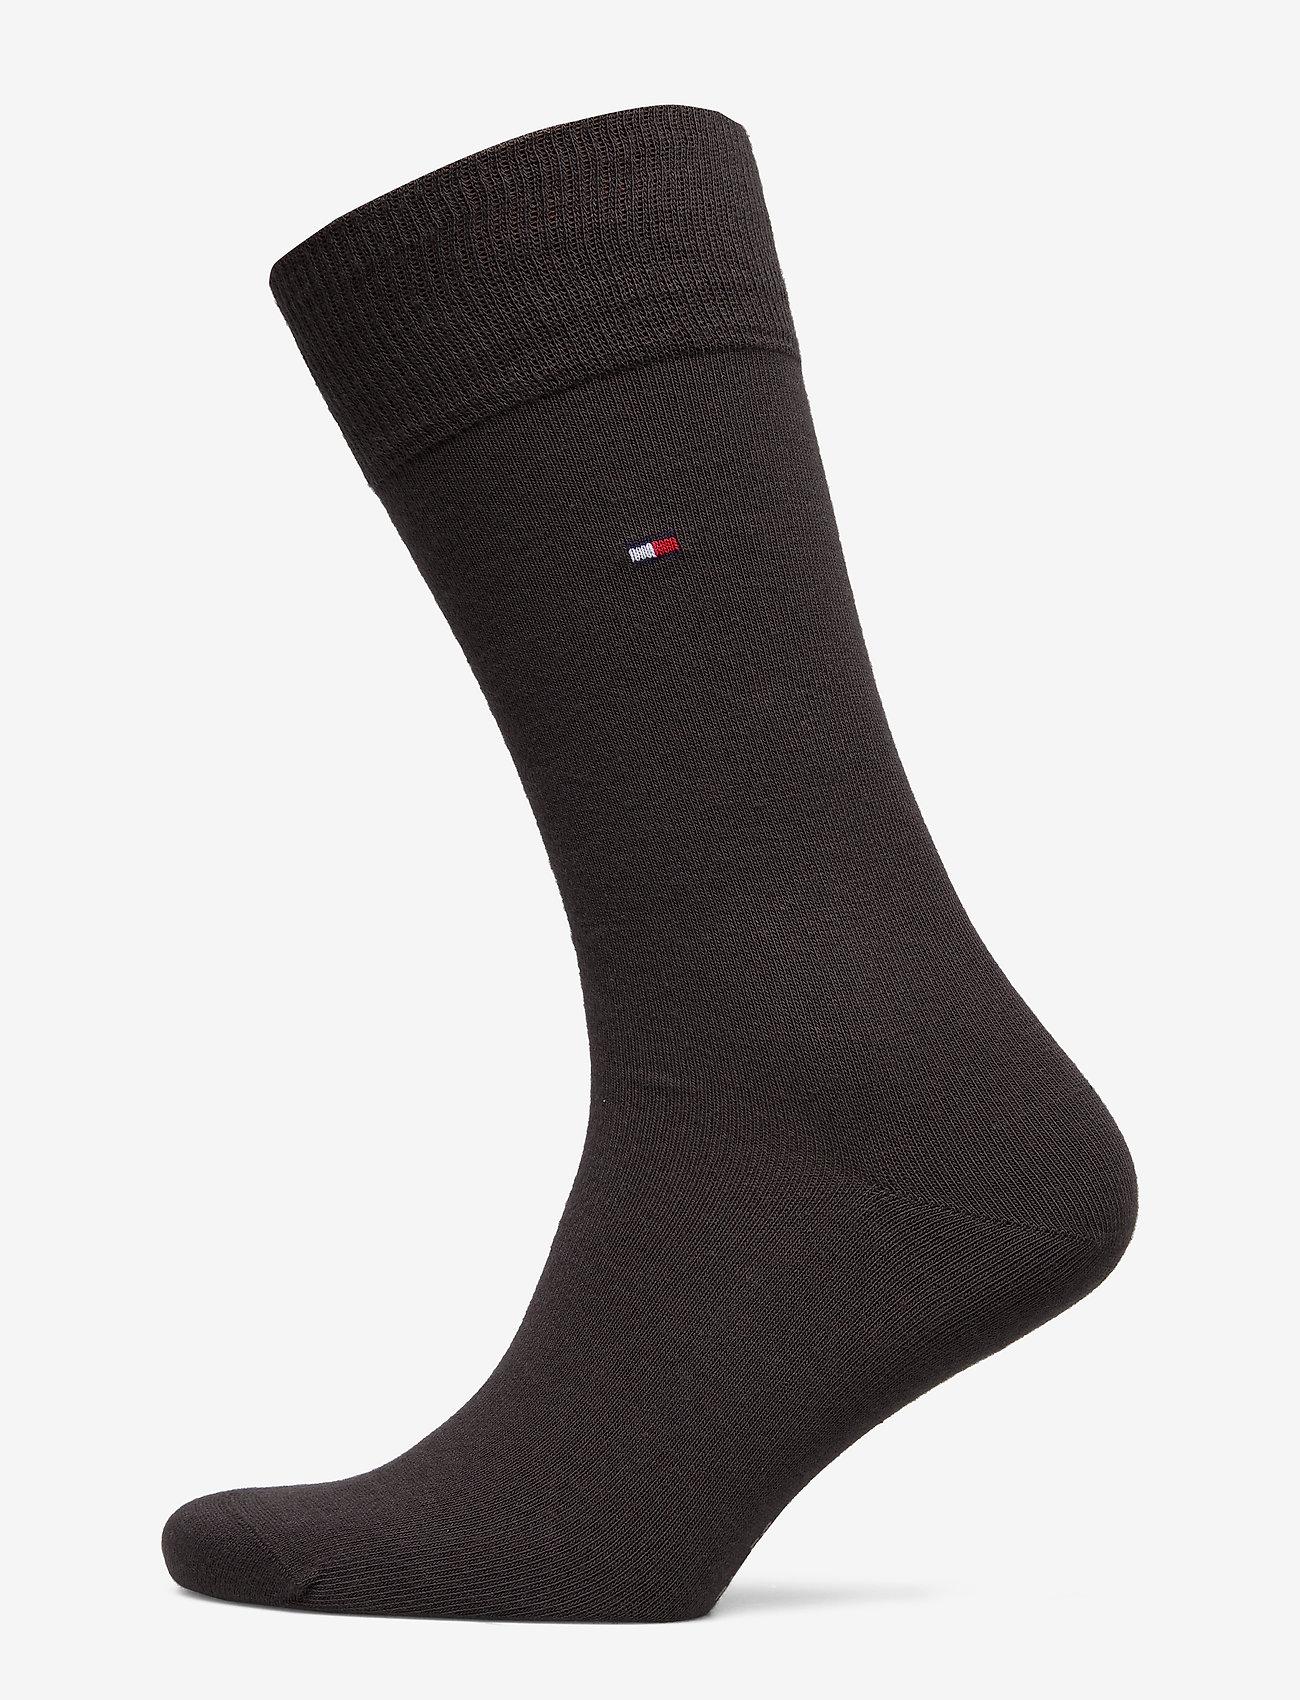 Tommy Hilfiger - SOCKS 2-PAIRS - regulære sokker - kensington brown - 0